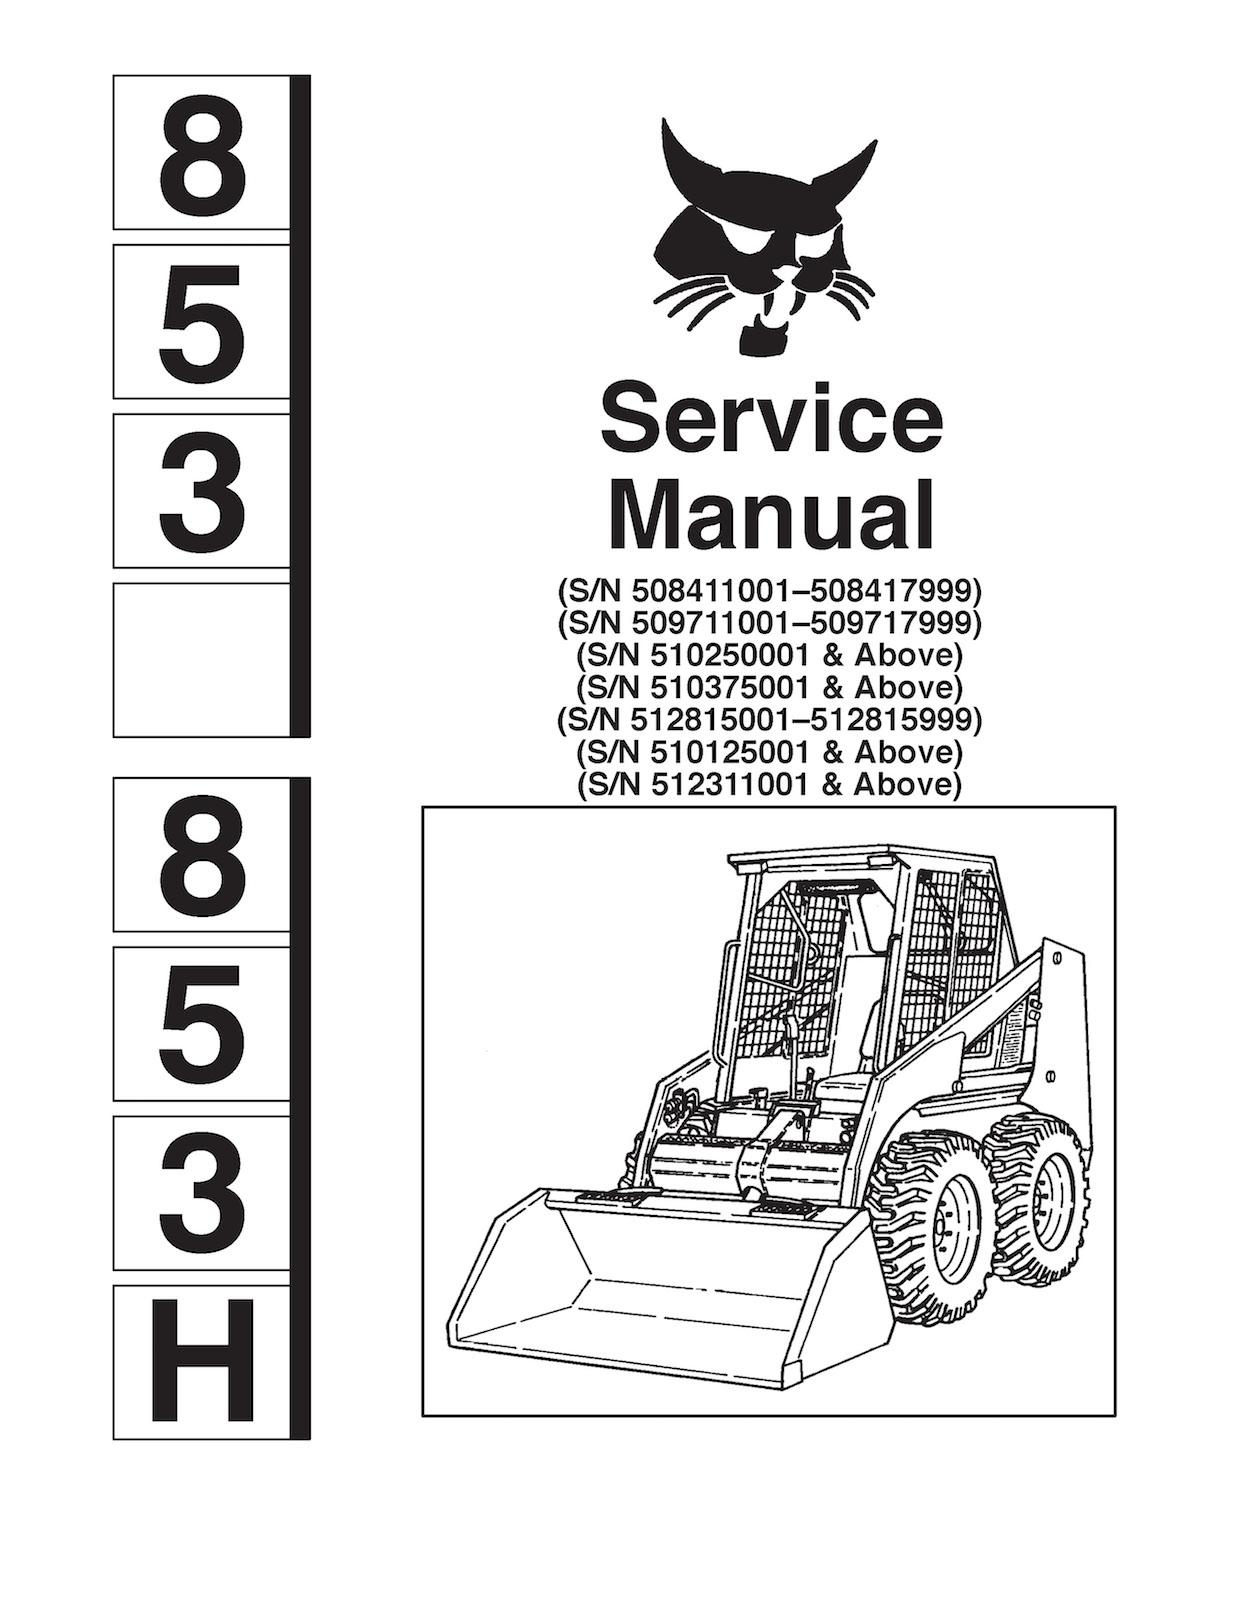 Bobcat 853 And 853h Skid Steer Loader Oem Service Andrhsellfy: Wiring Diagram For Bobcat 853 At Gmaili.net